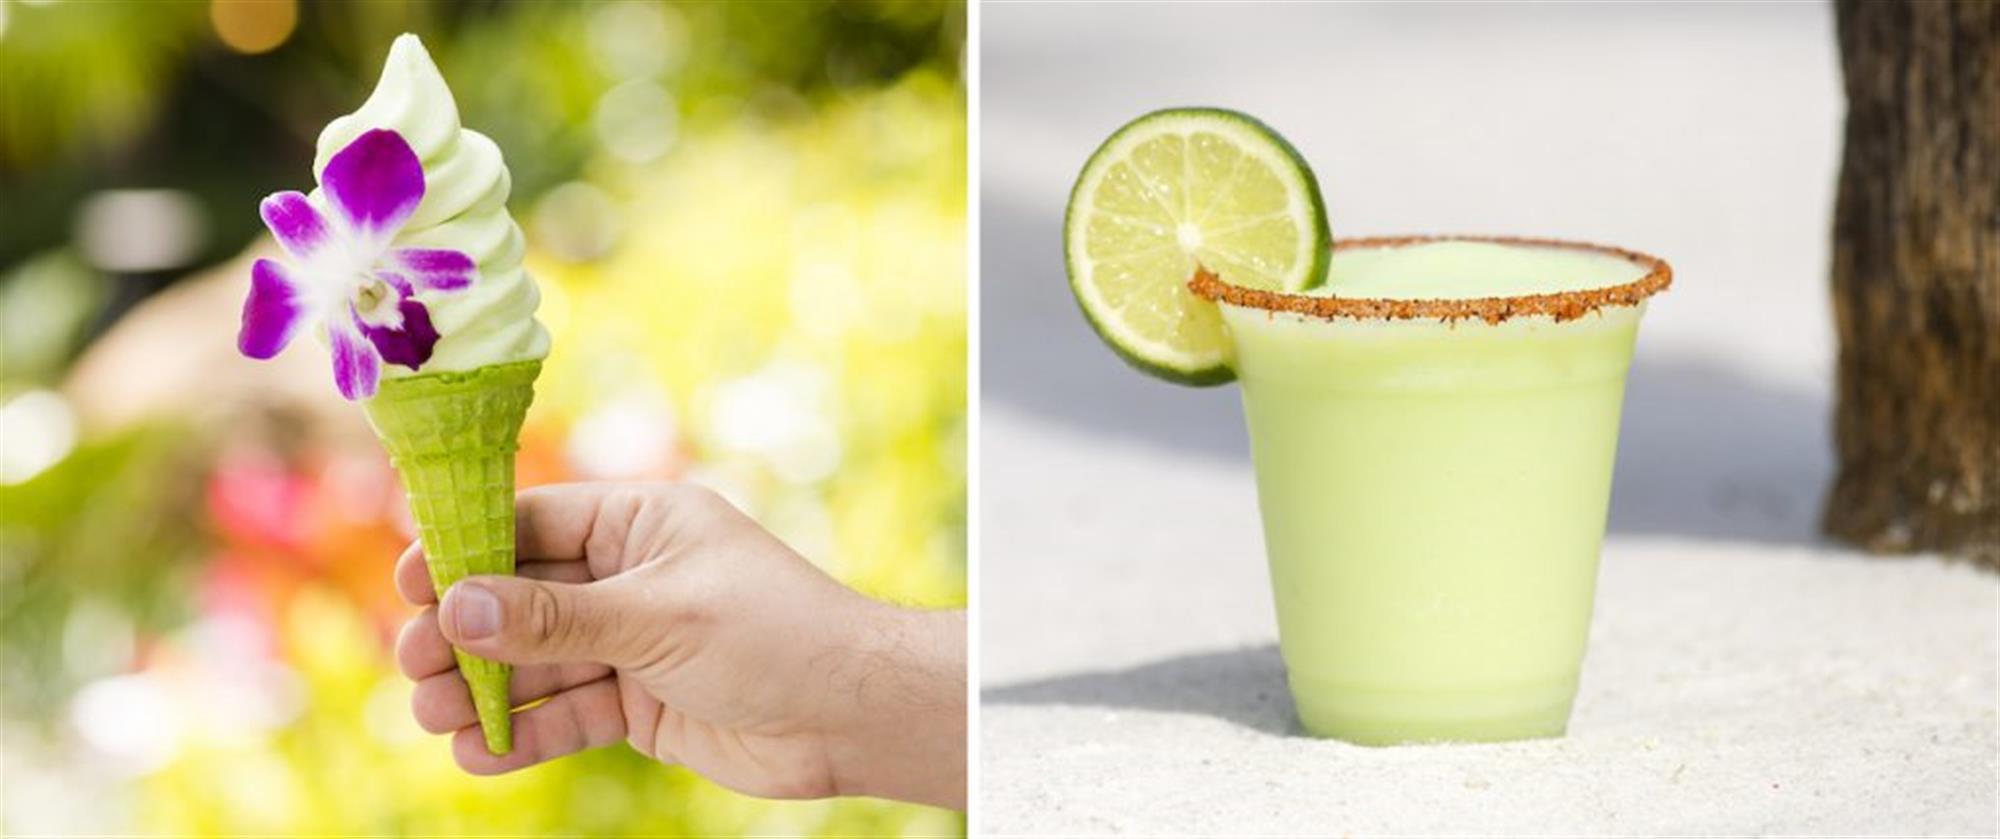 New Lime Offerings at Disney's Polynesian Village Resort